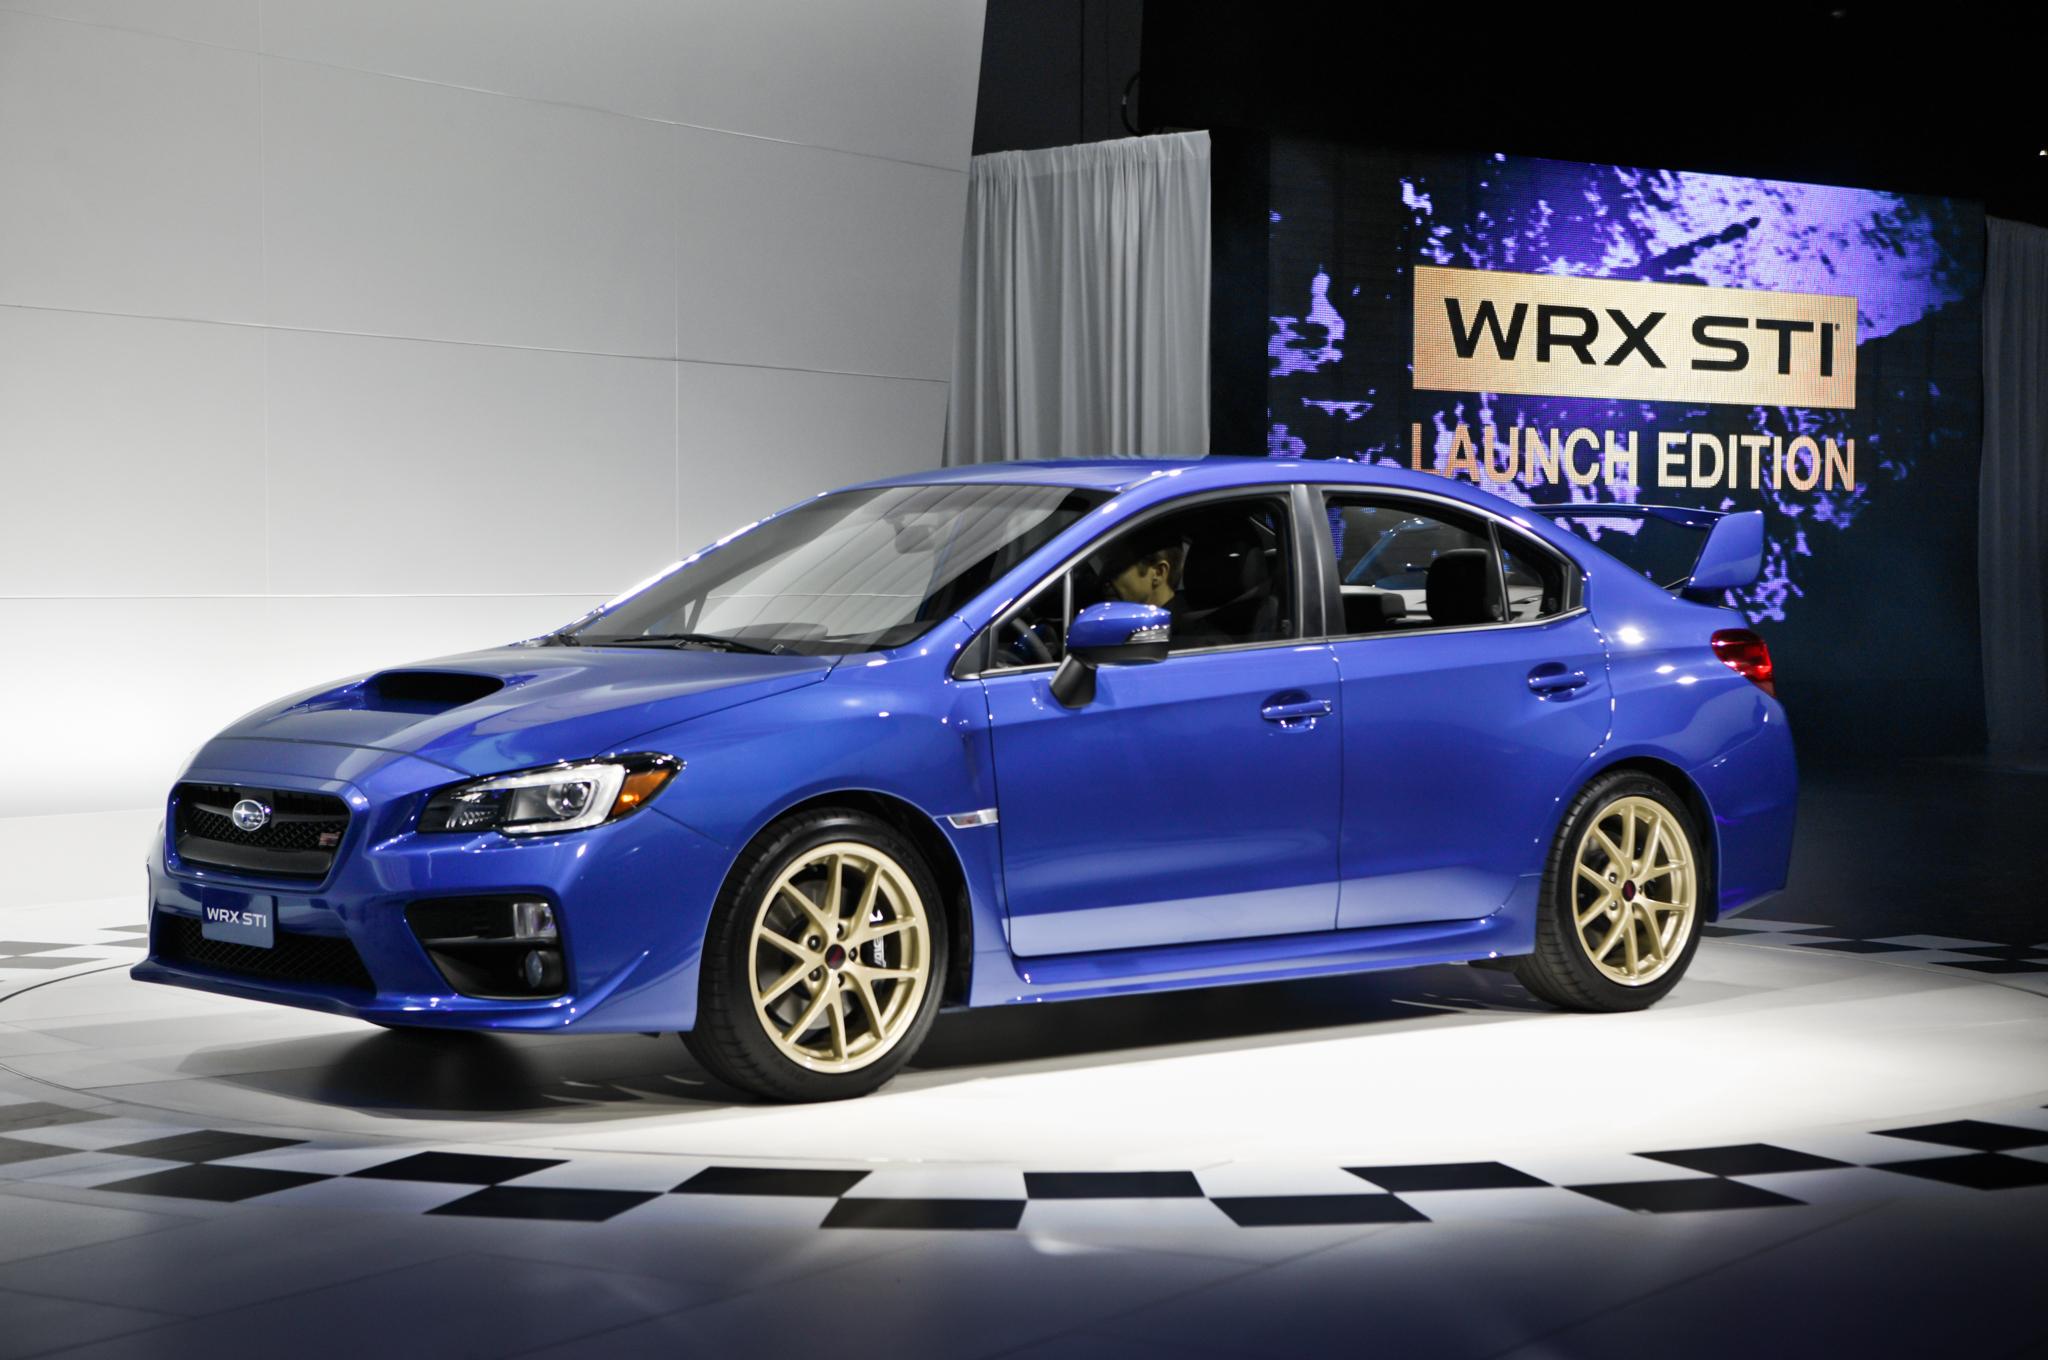 2015 Subaru WRX-STI Launch Edition